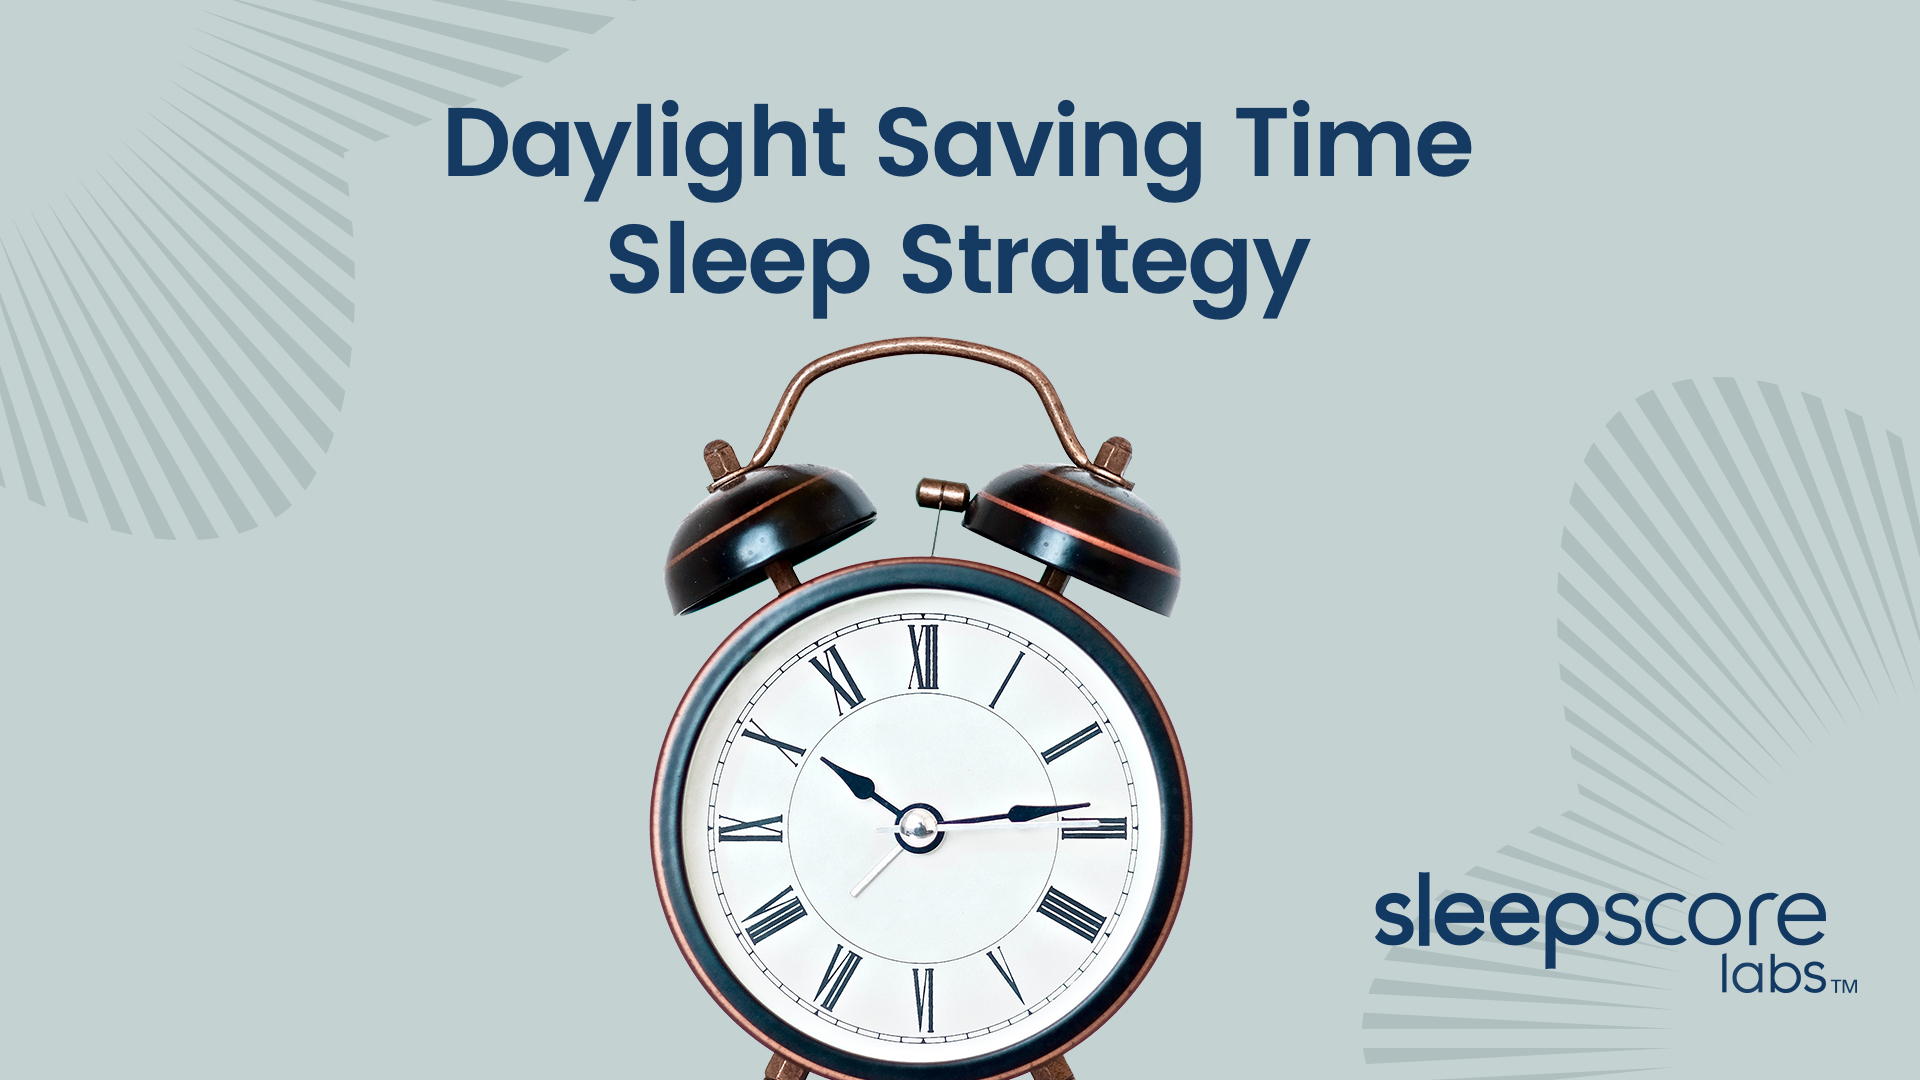 SleepScore App Helps You Prepare for Daylight Saving Time